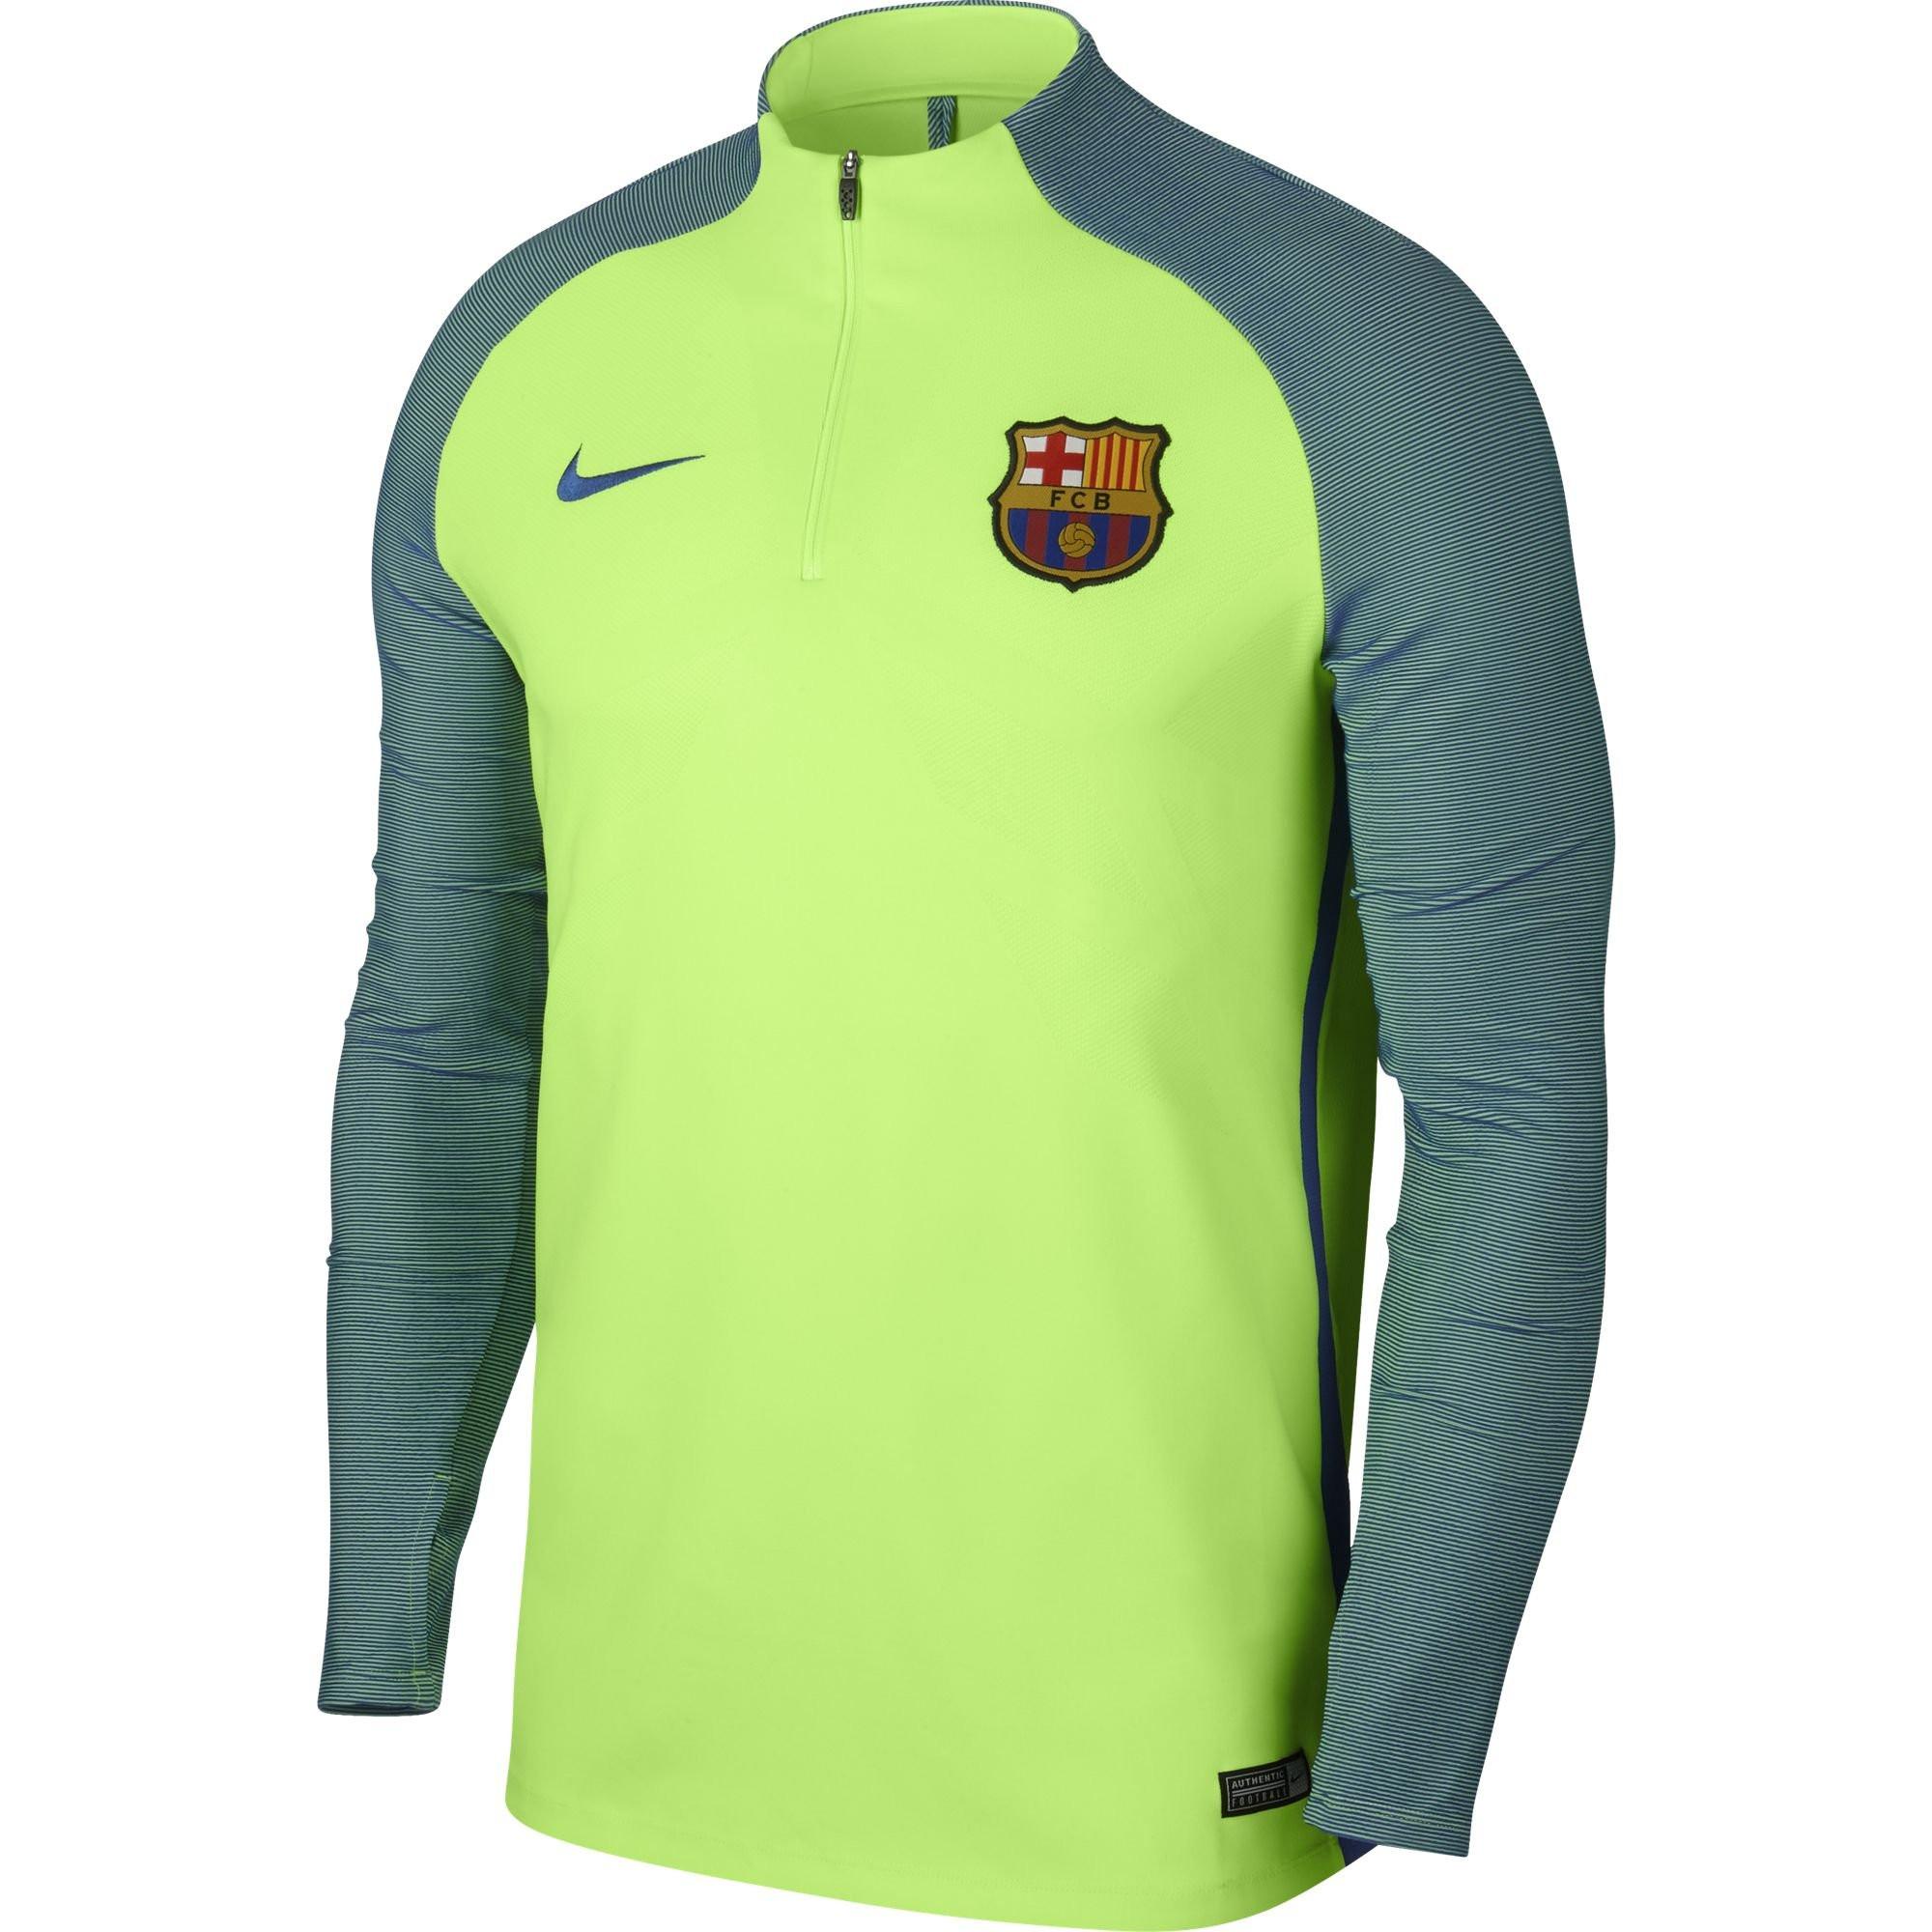 Nike barcelone trg top elite vert pomme 2016 2017 for Univers du jardin maule 78